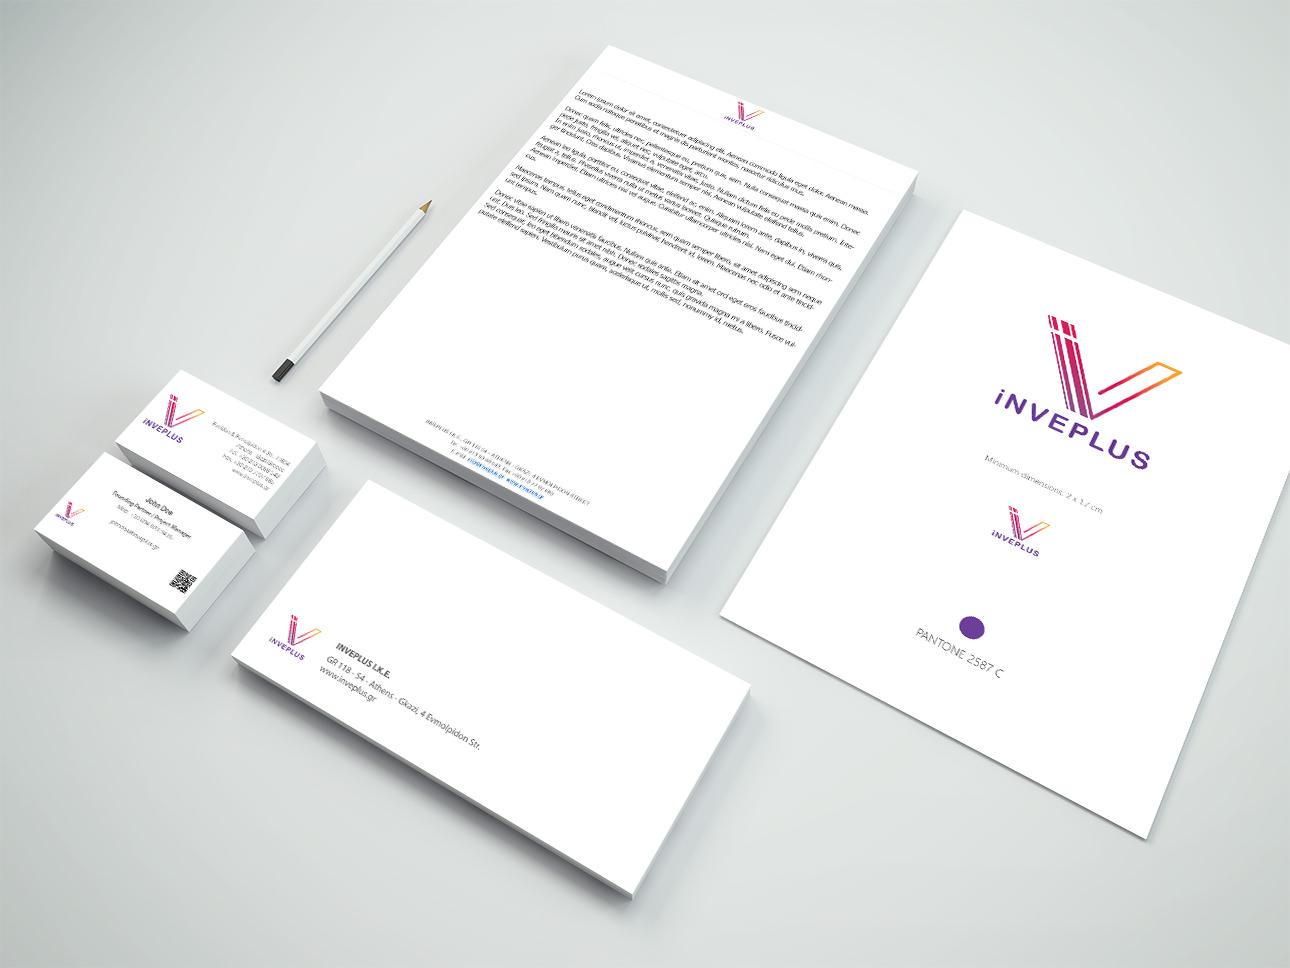 inveplus-branding